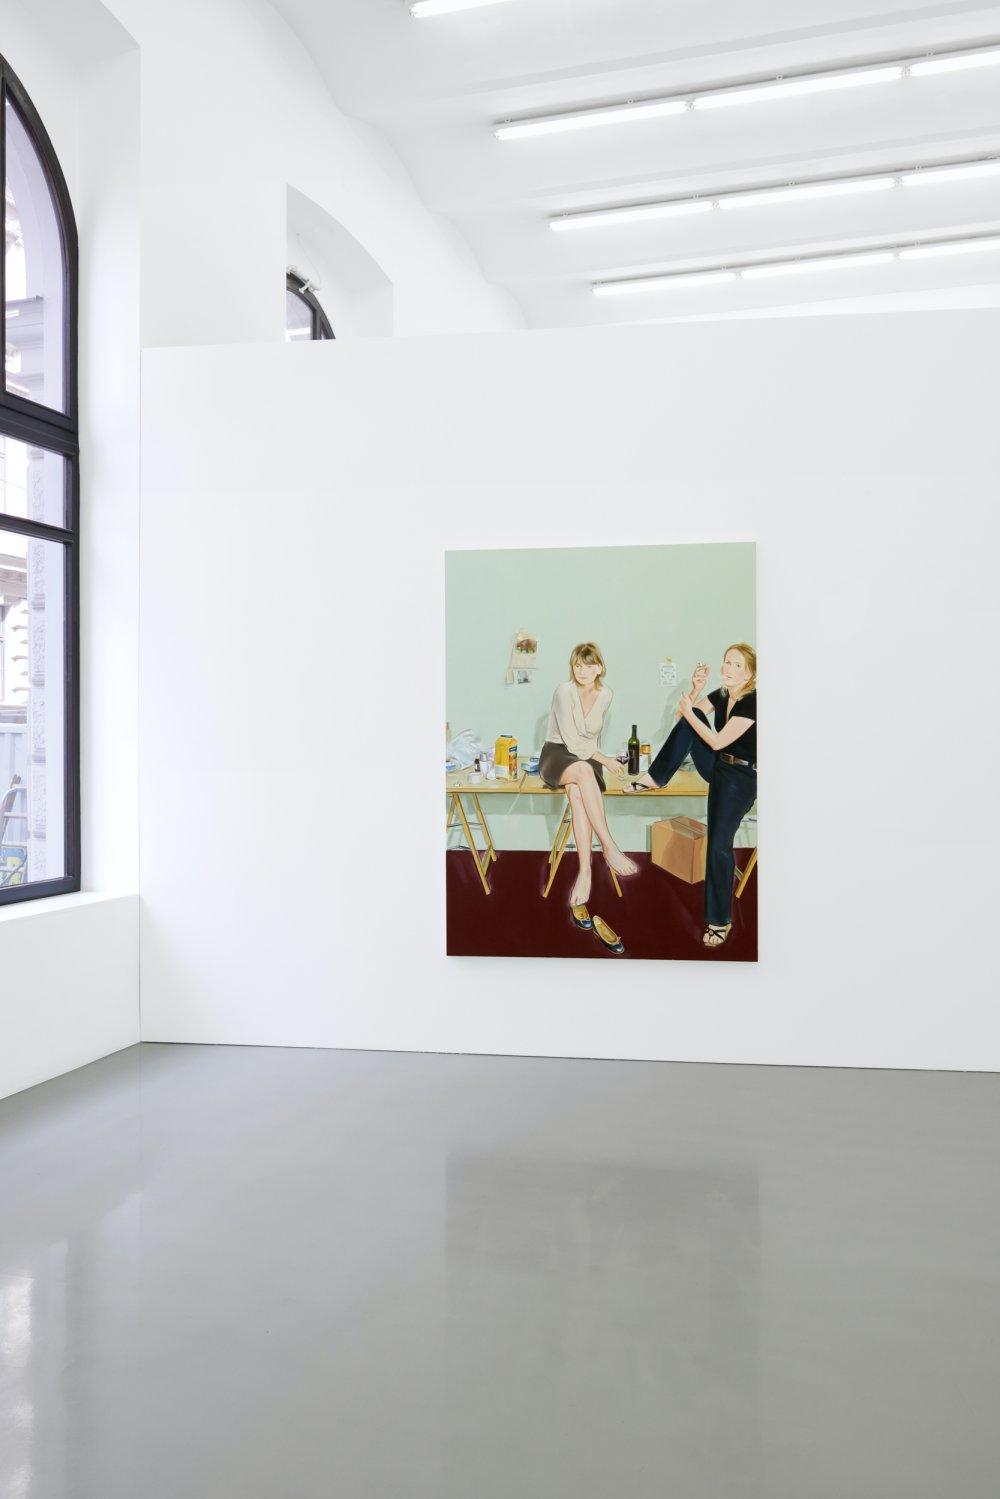 Galerie Meyer Kainer Marcin Maciejowski 2